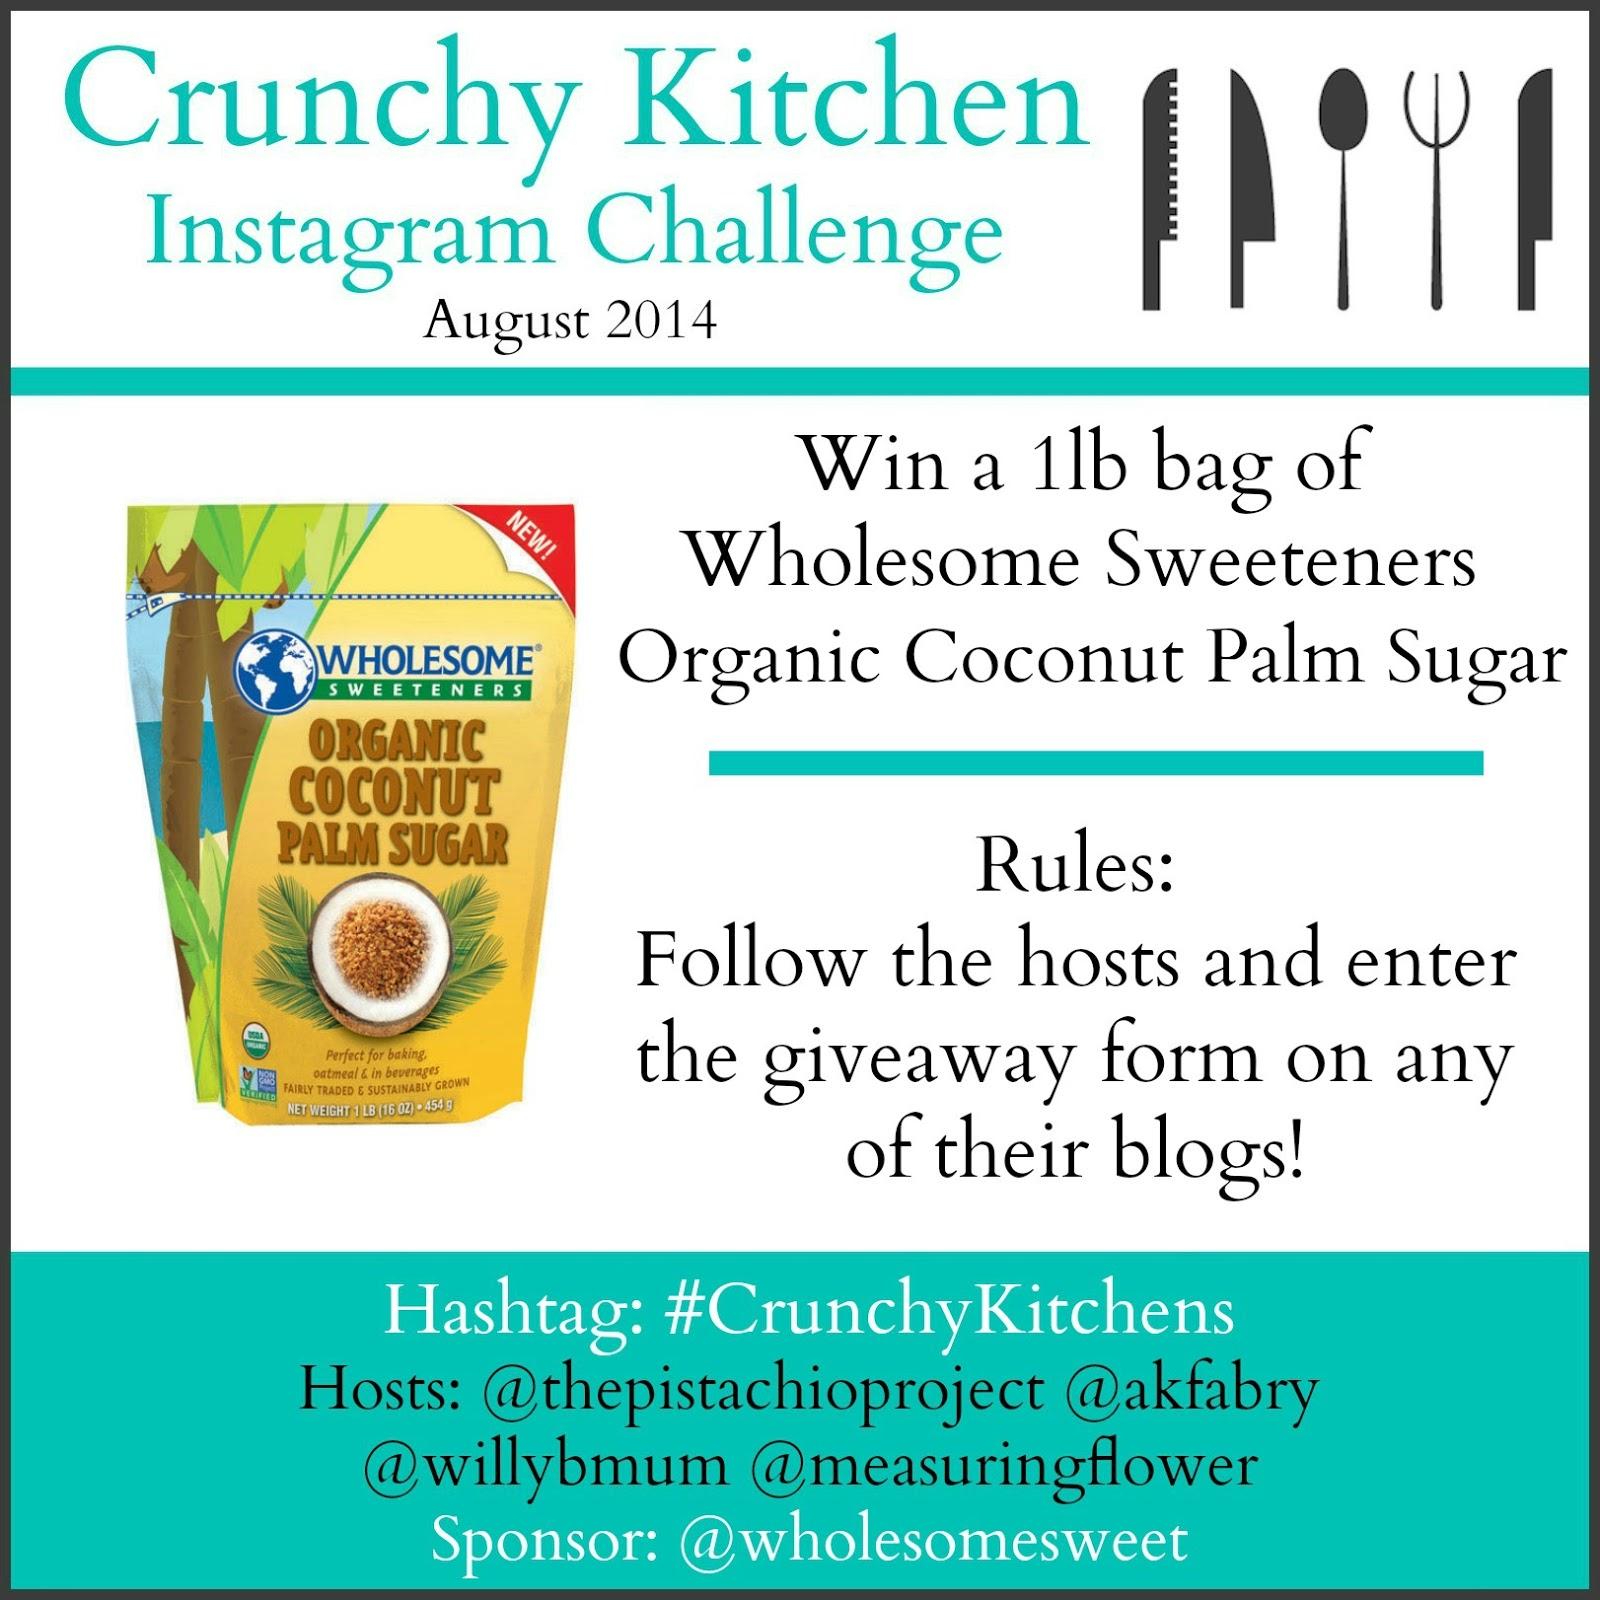 Crunchy Kitchens Instagram Challenge Giveaways